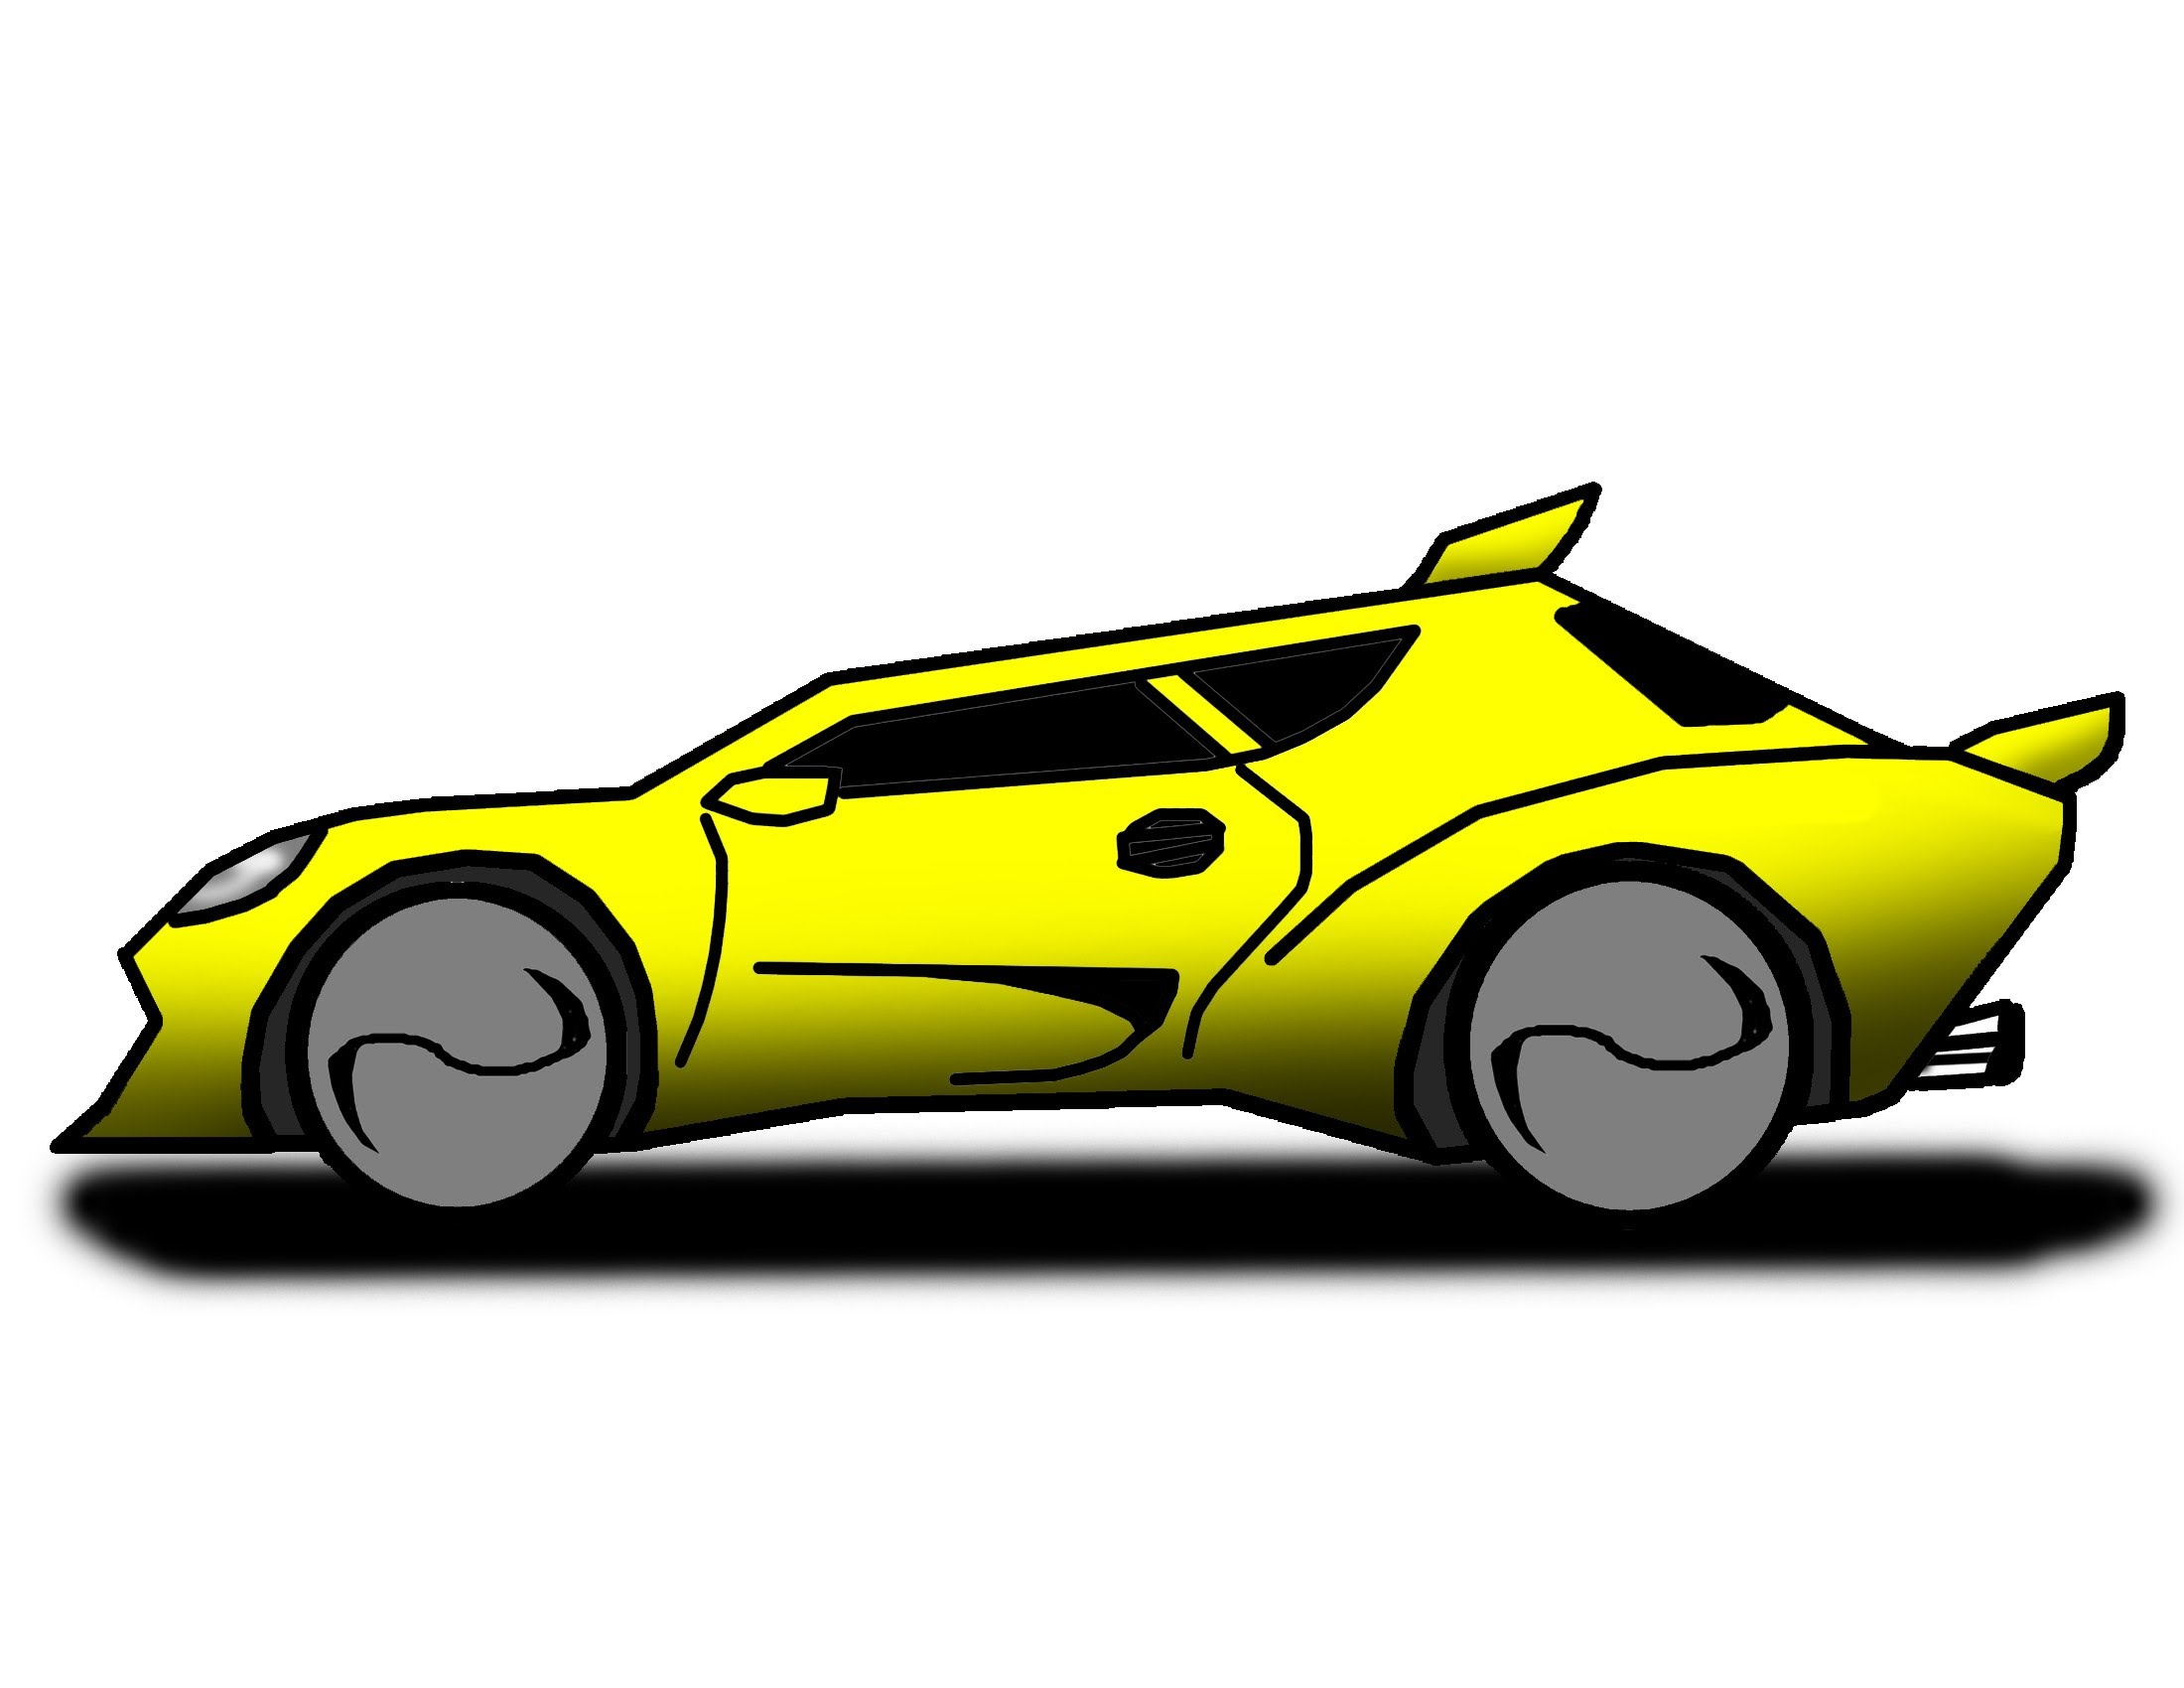 2200x1700 Nascar Clipart Sports Car Outline Frames Illustrations Hd